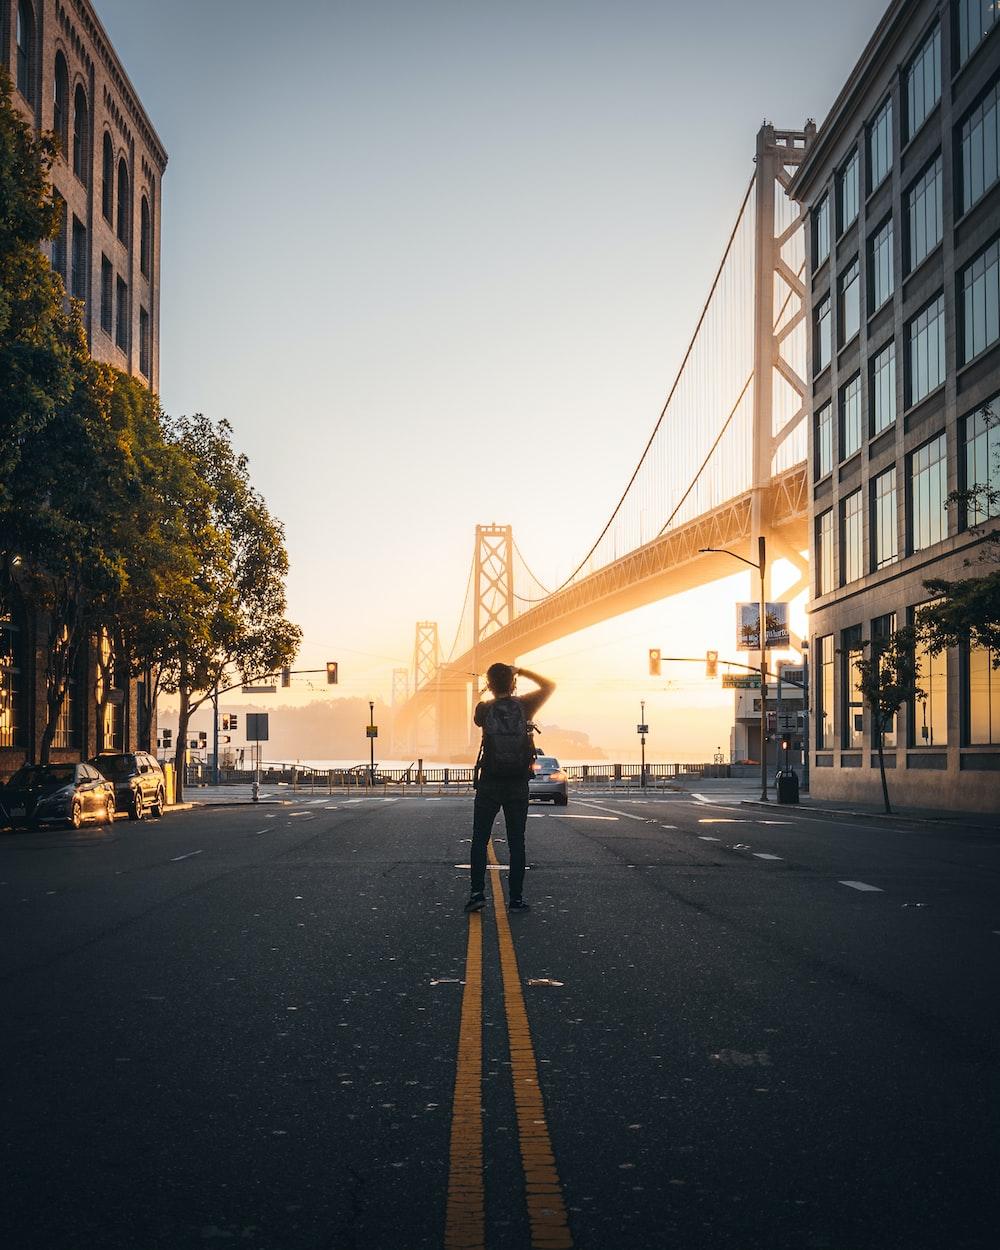 man takes photo of suspension bridge at the city during daytime